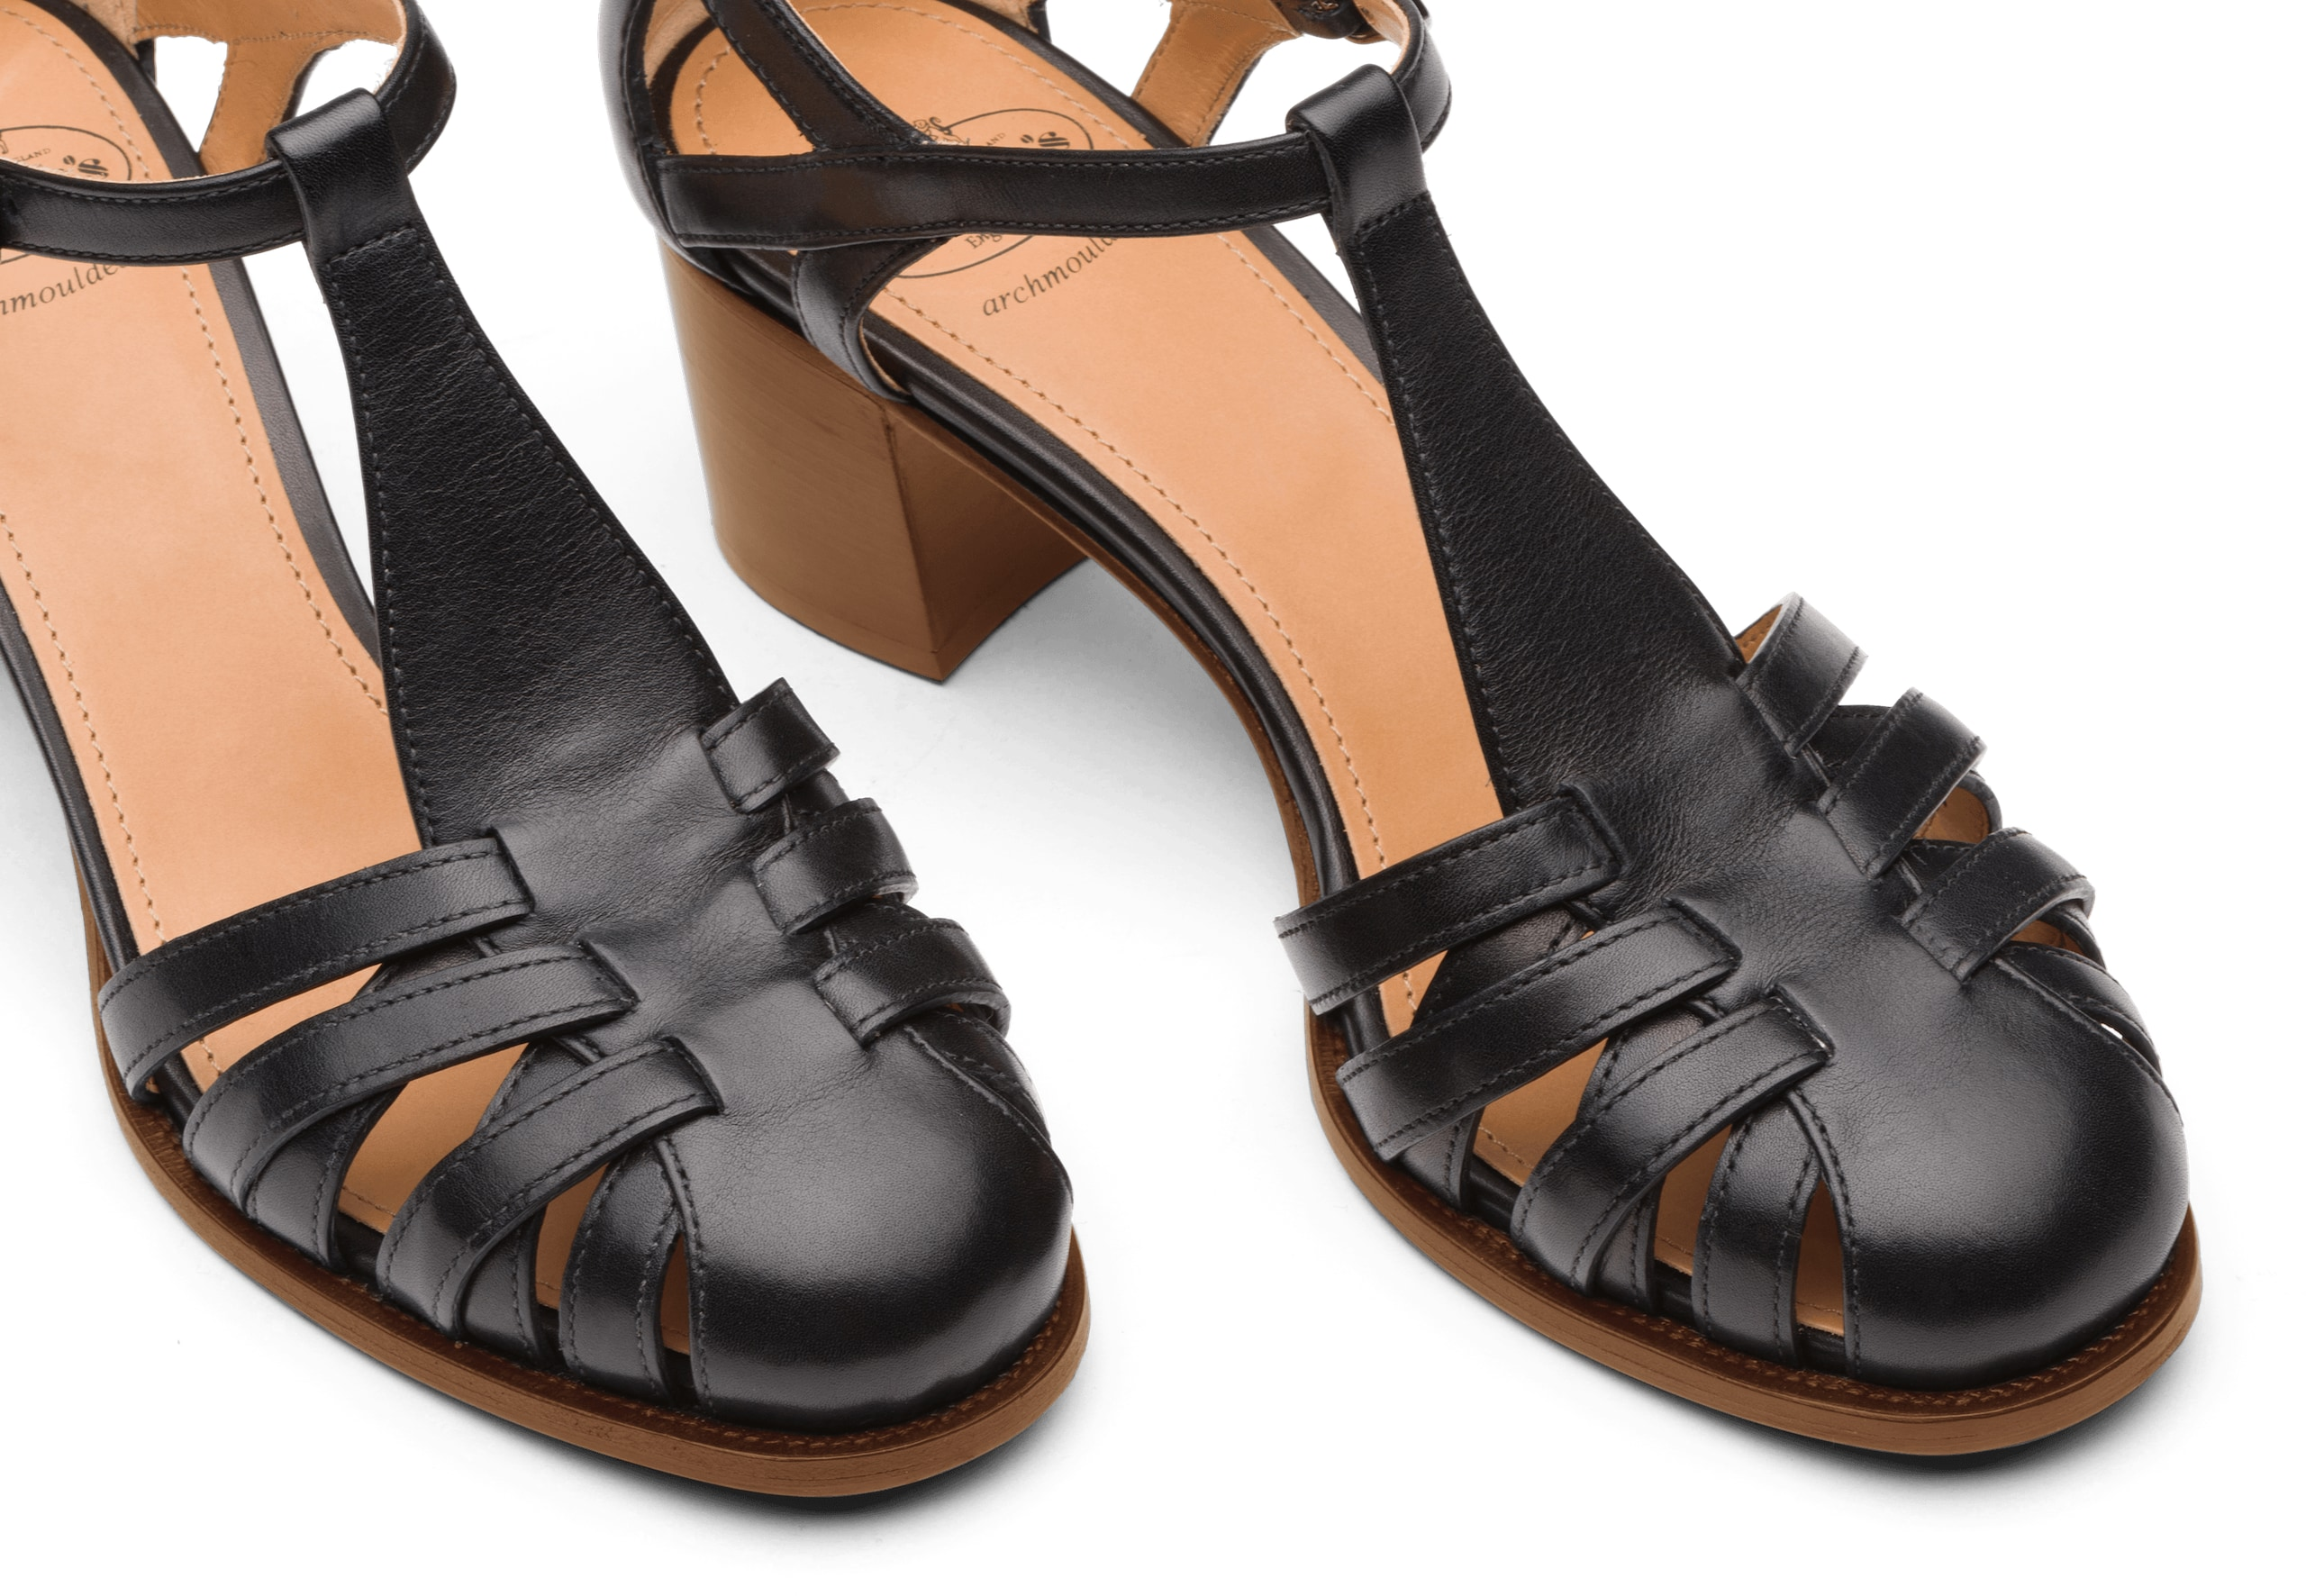 Deanne 50 Church's Smart Nappa Leather Mid Heel Sandal Black